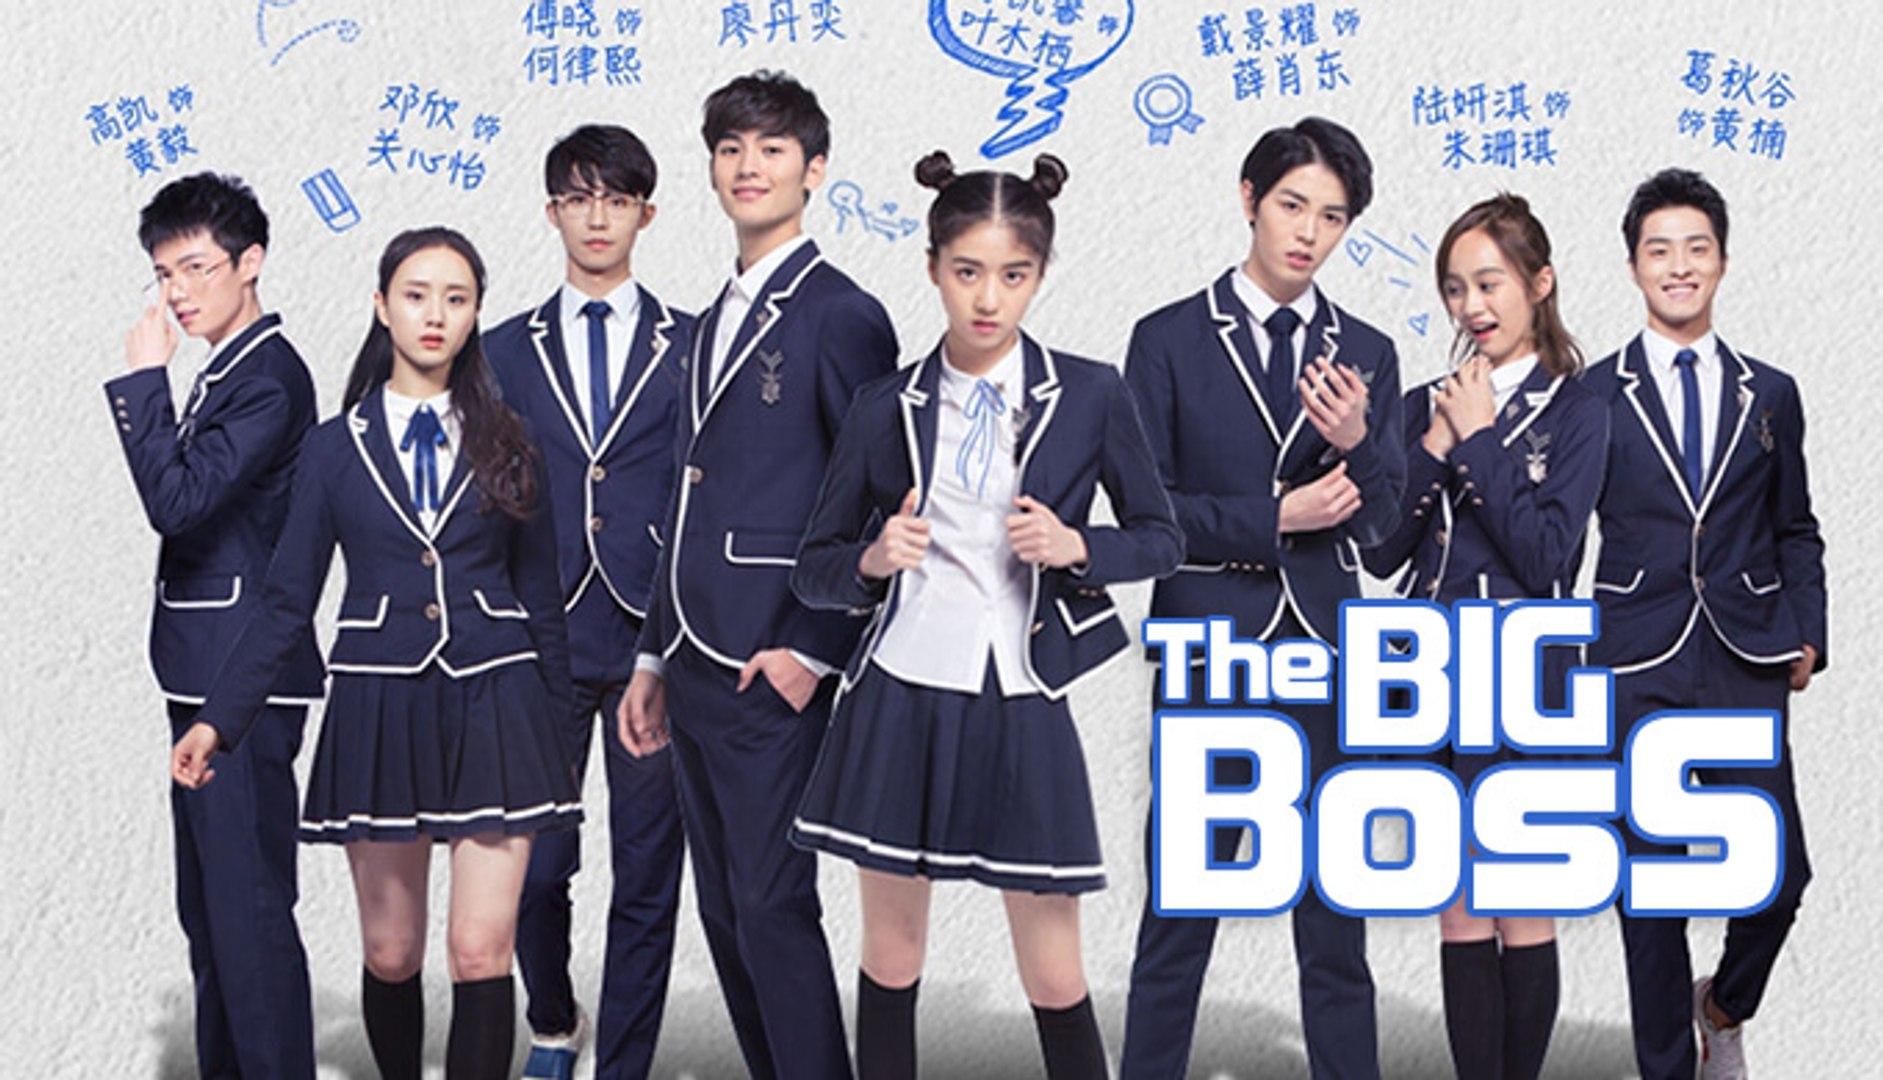 班长大人 - The Big Boss 2017 Ep 1 Engsub